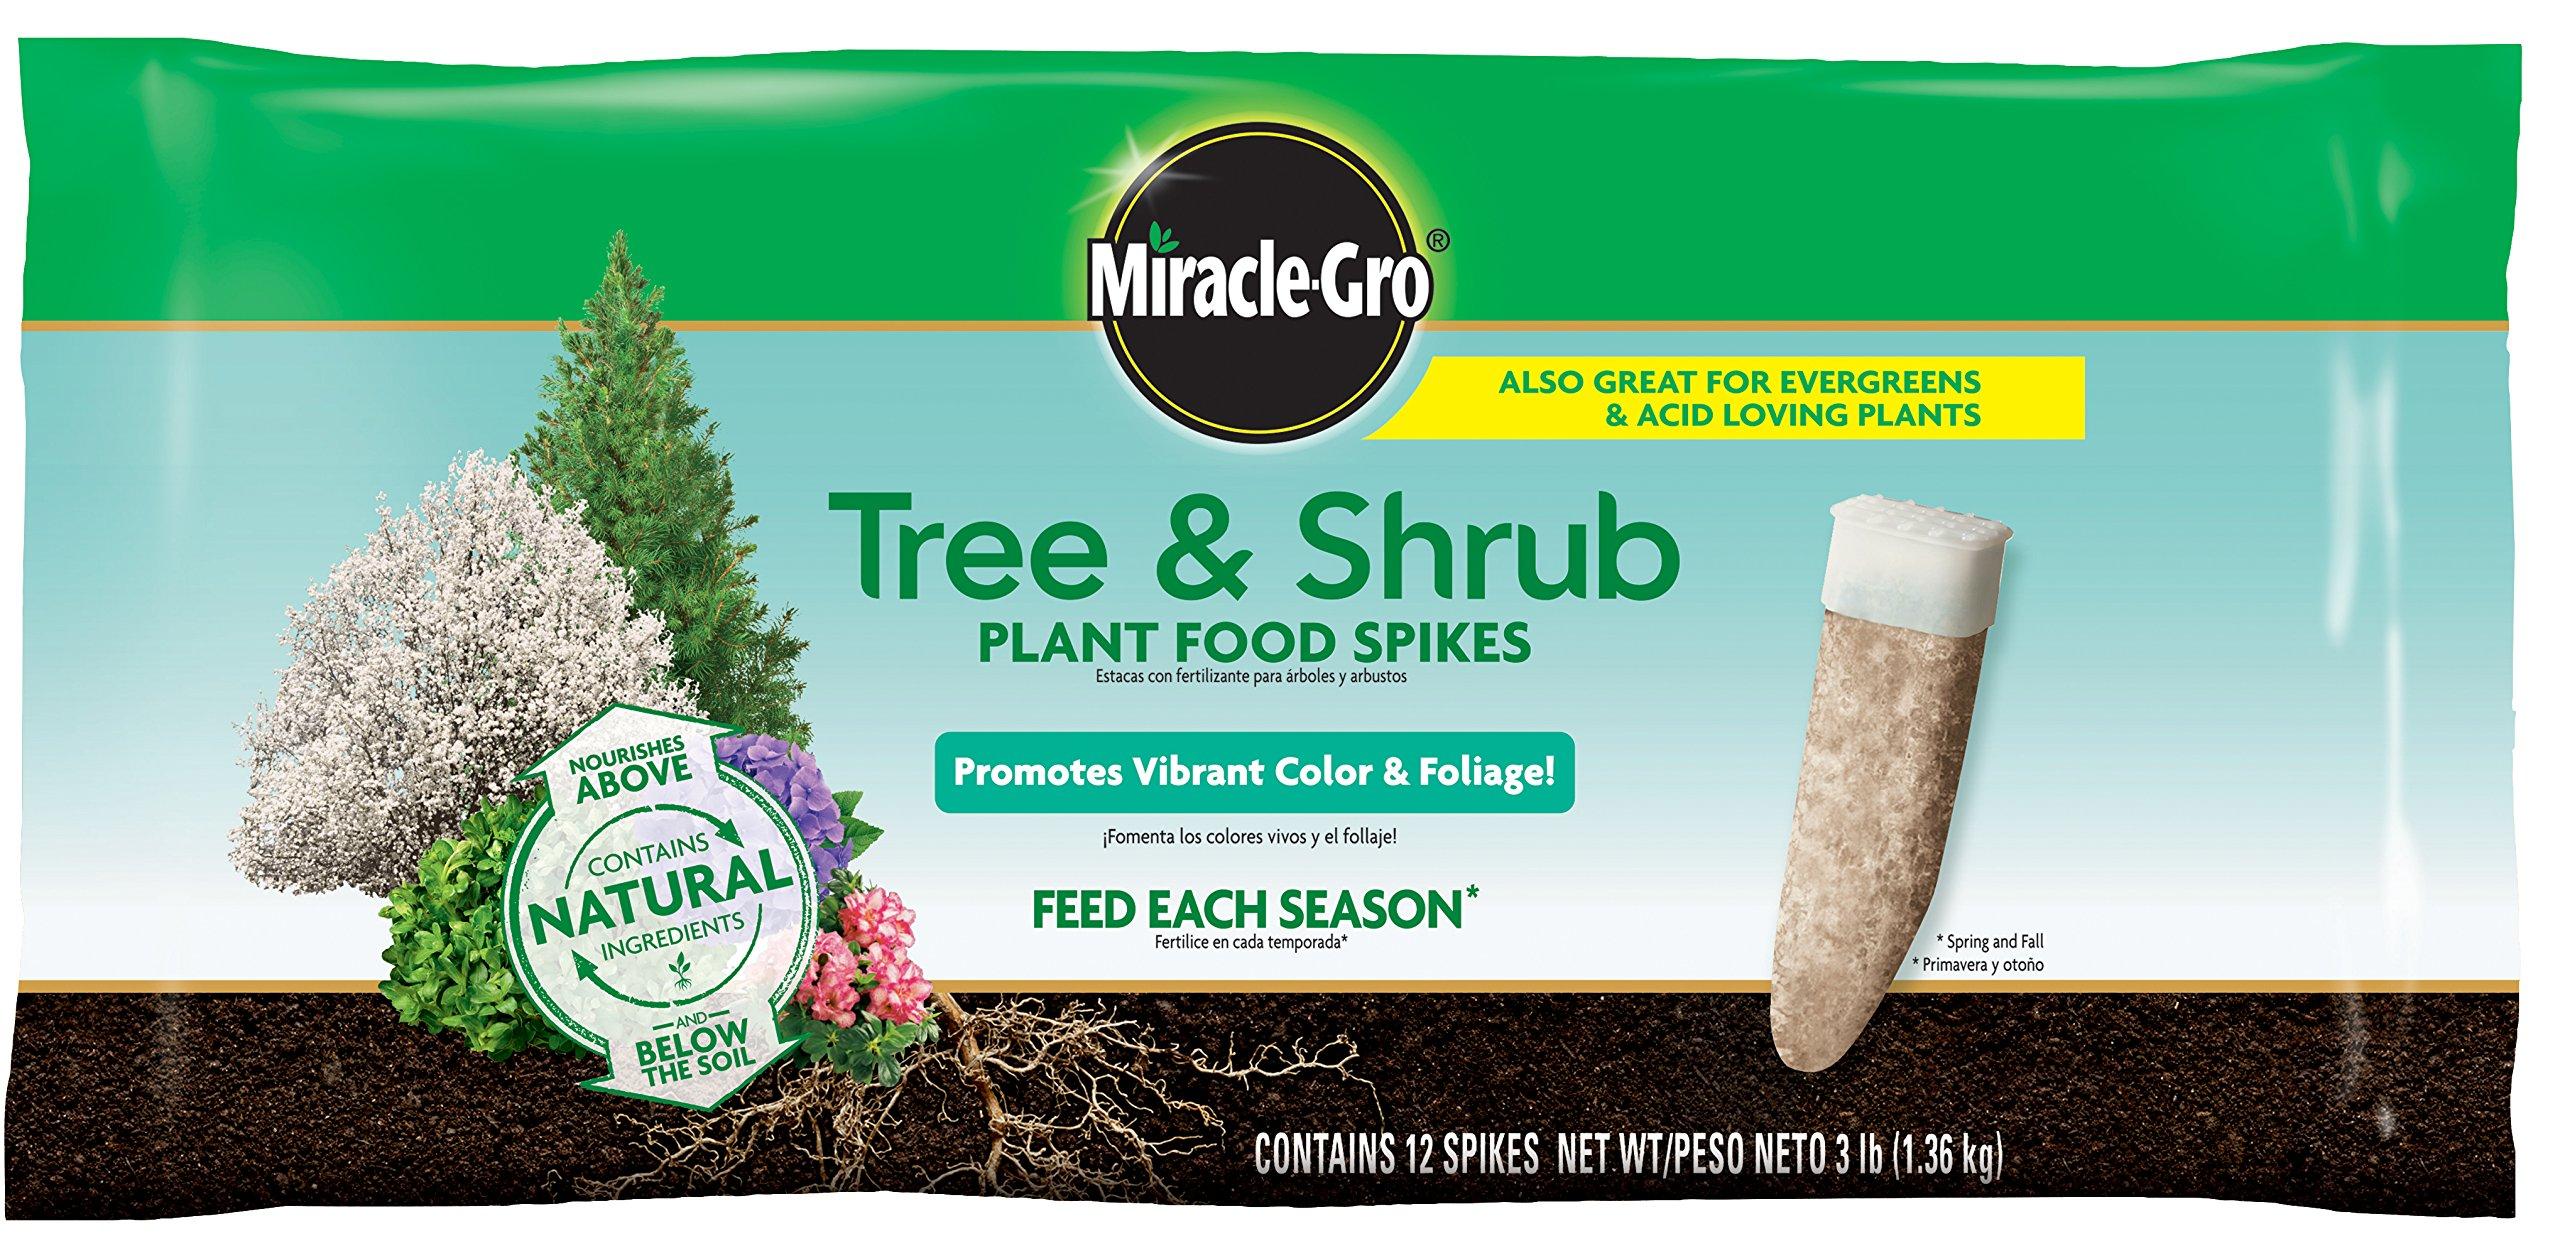 Miracle-Gro Tree & Shrub Fertilizer Spikes - 12 PK